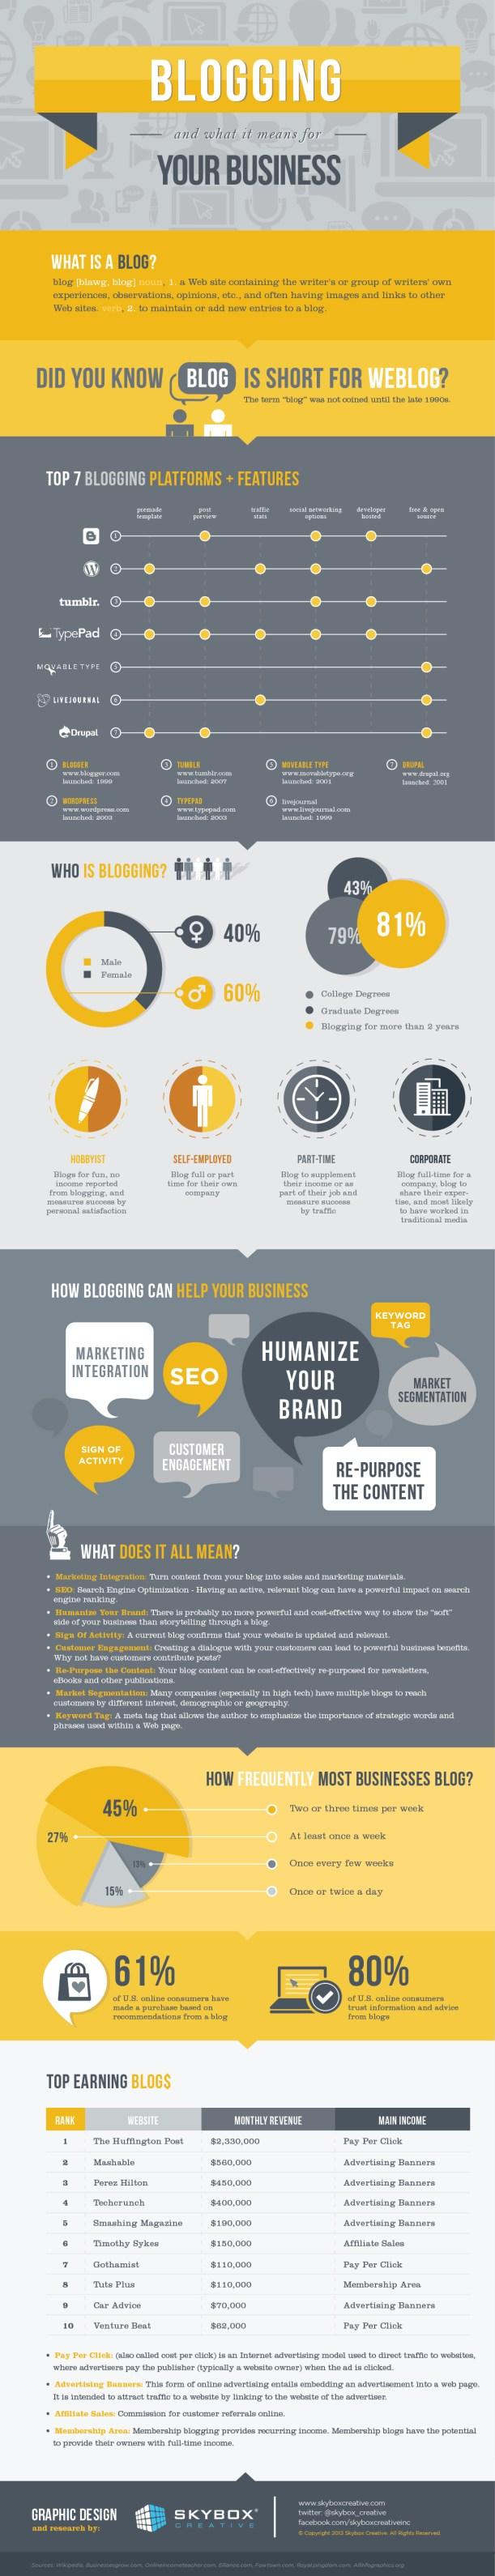 blogging-for-business-blogging-for-profit_50edc3c6c839f